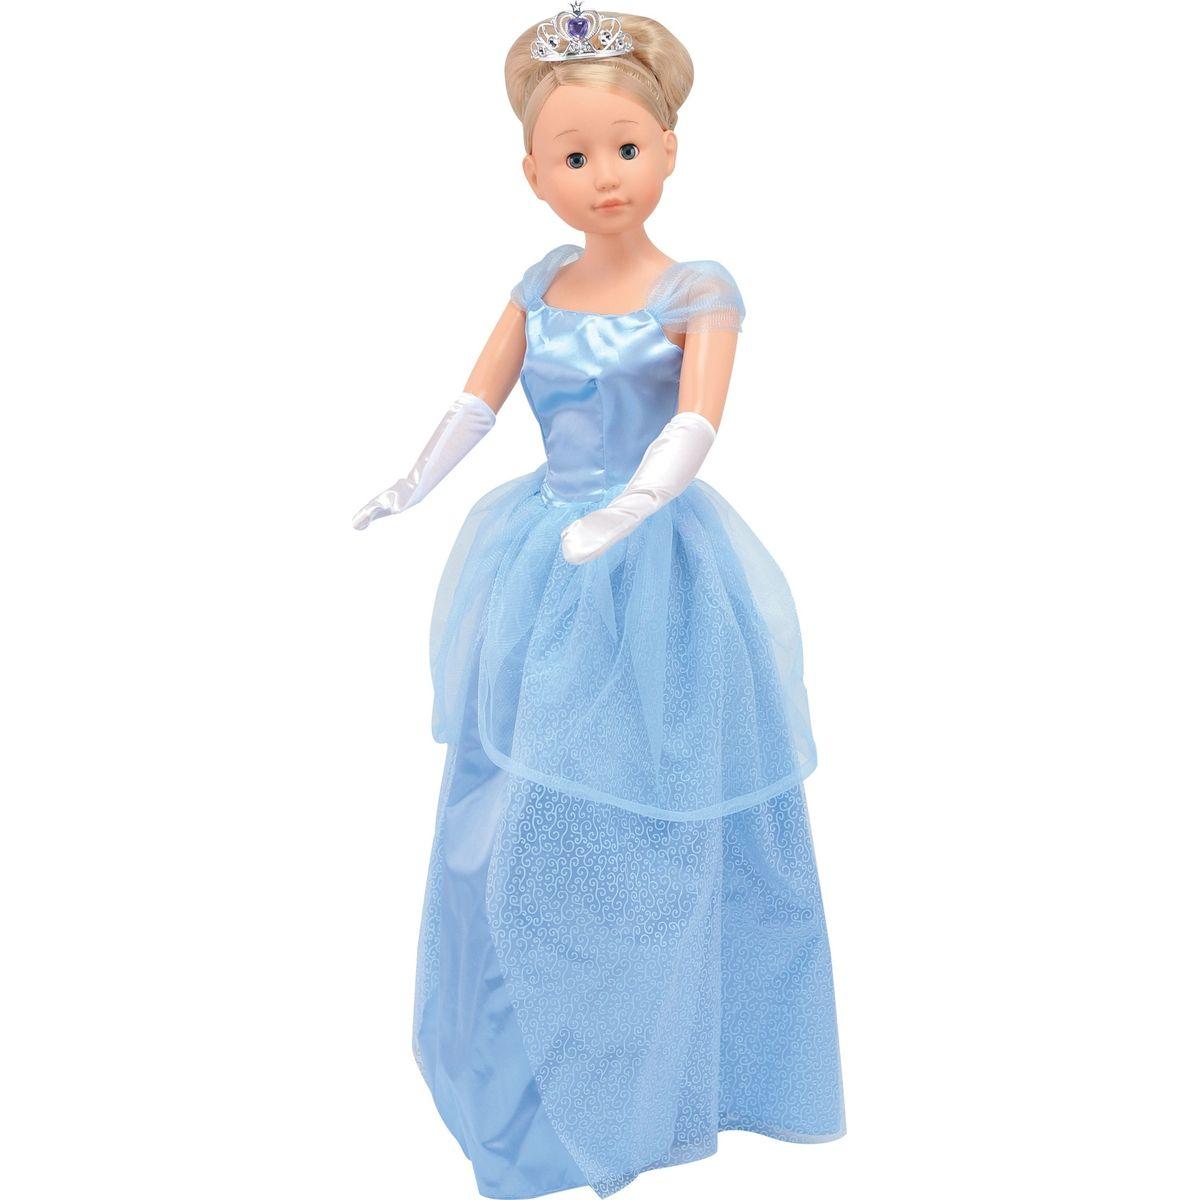 Dimian Panenka Bambolina Molly princezna 90cm - Modré šaty